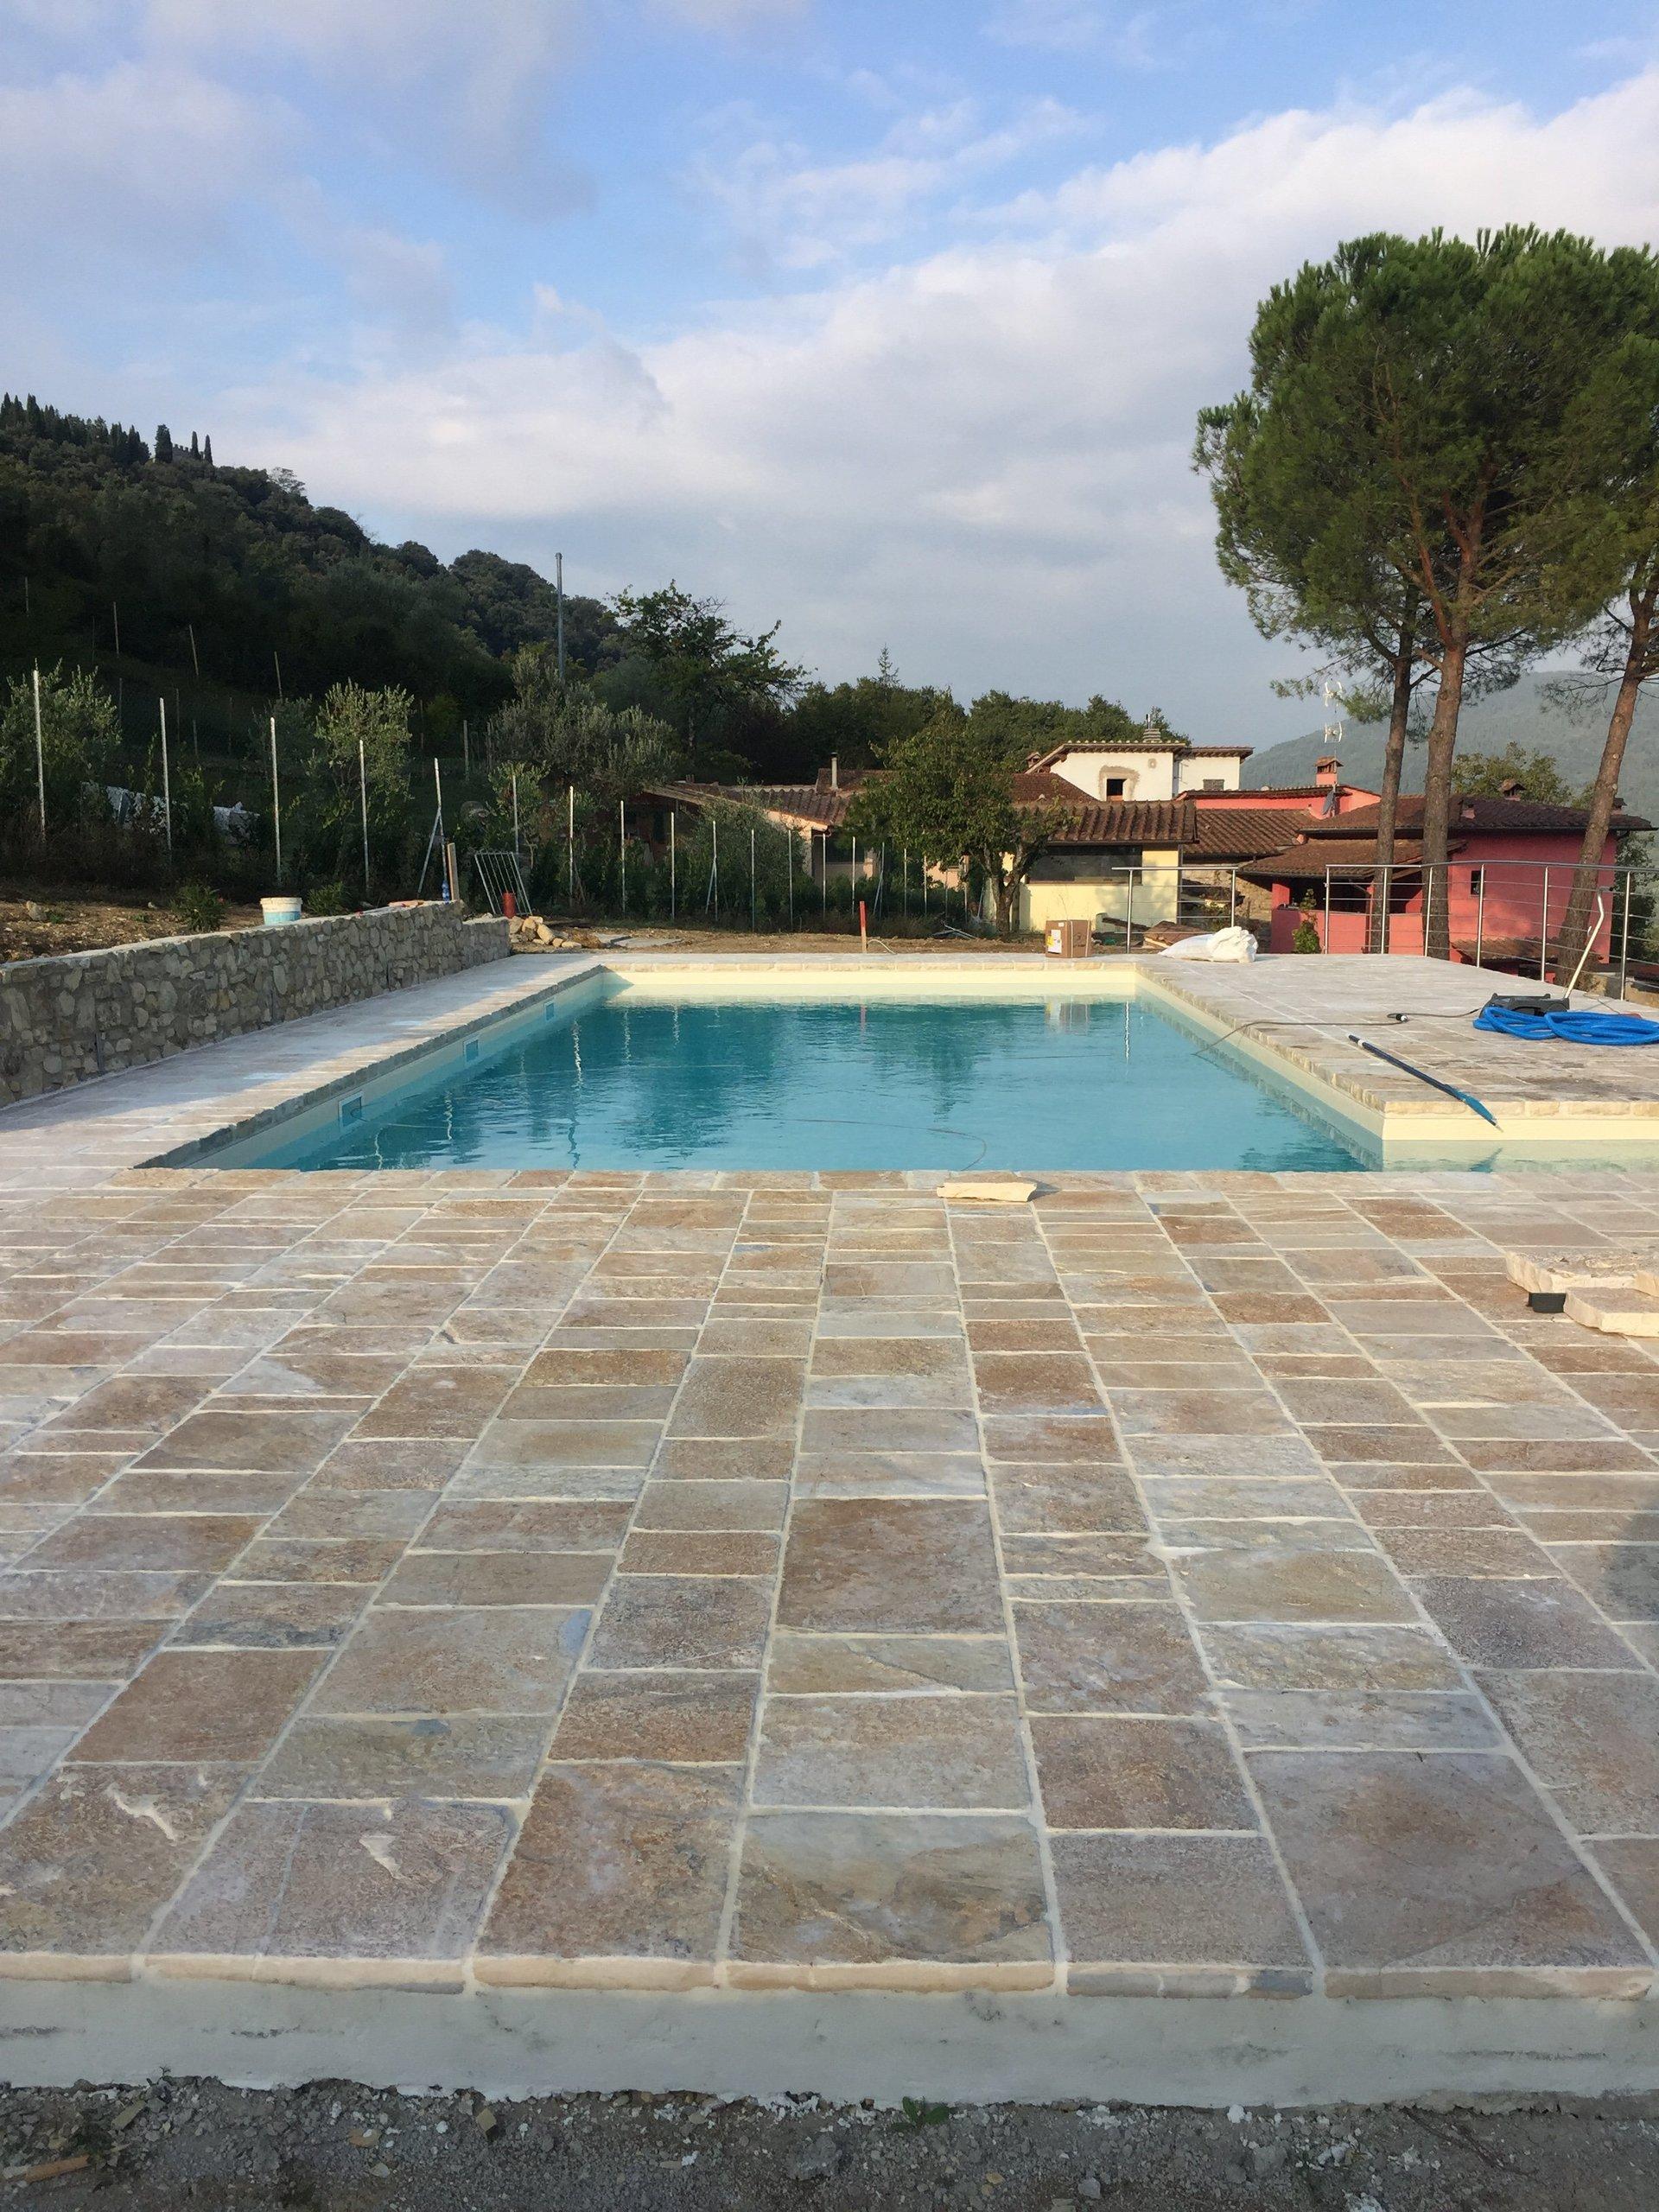 Realizzazione piscine firenze aqva service - Piscine interrate firenze ...